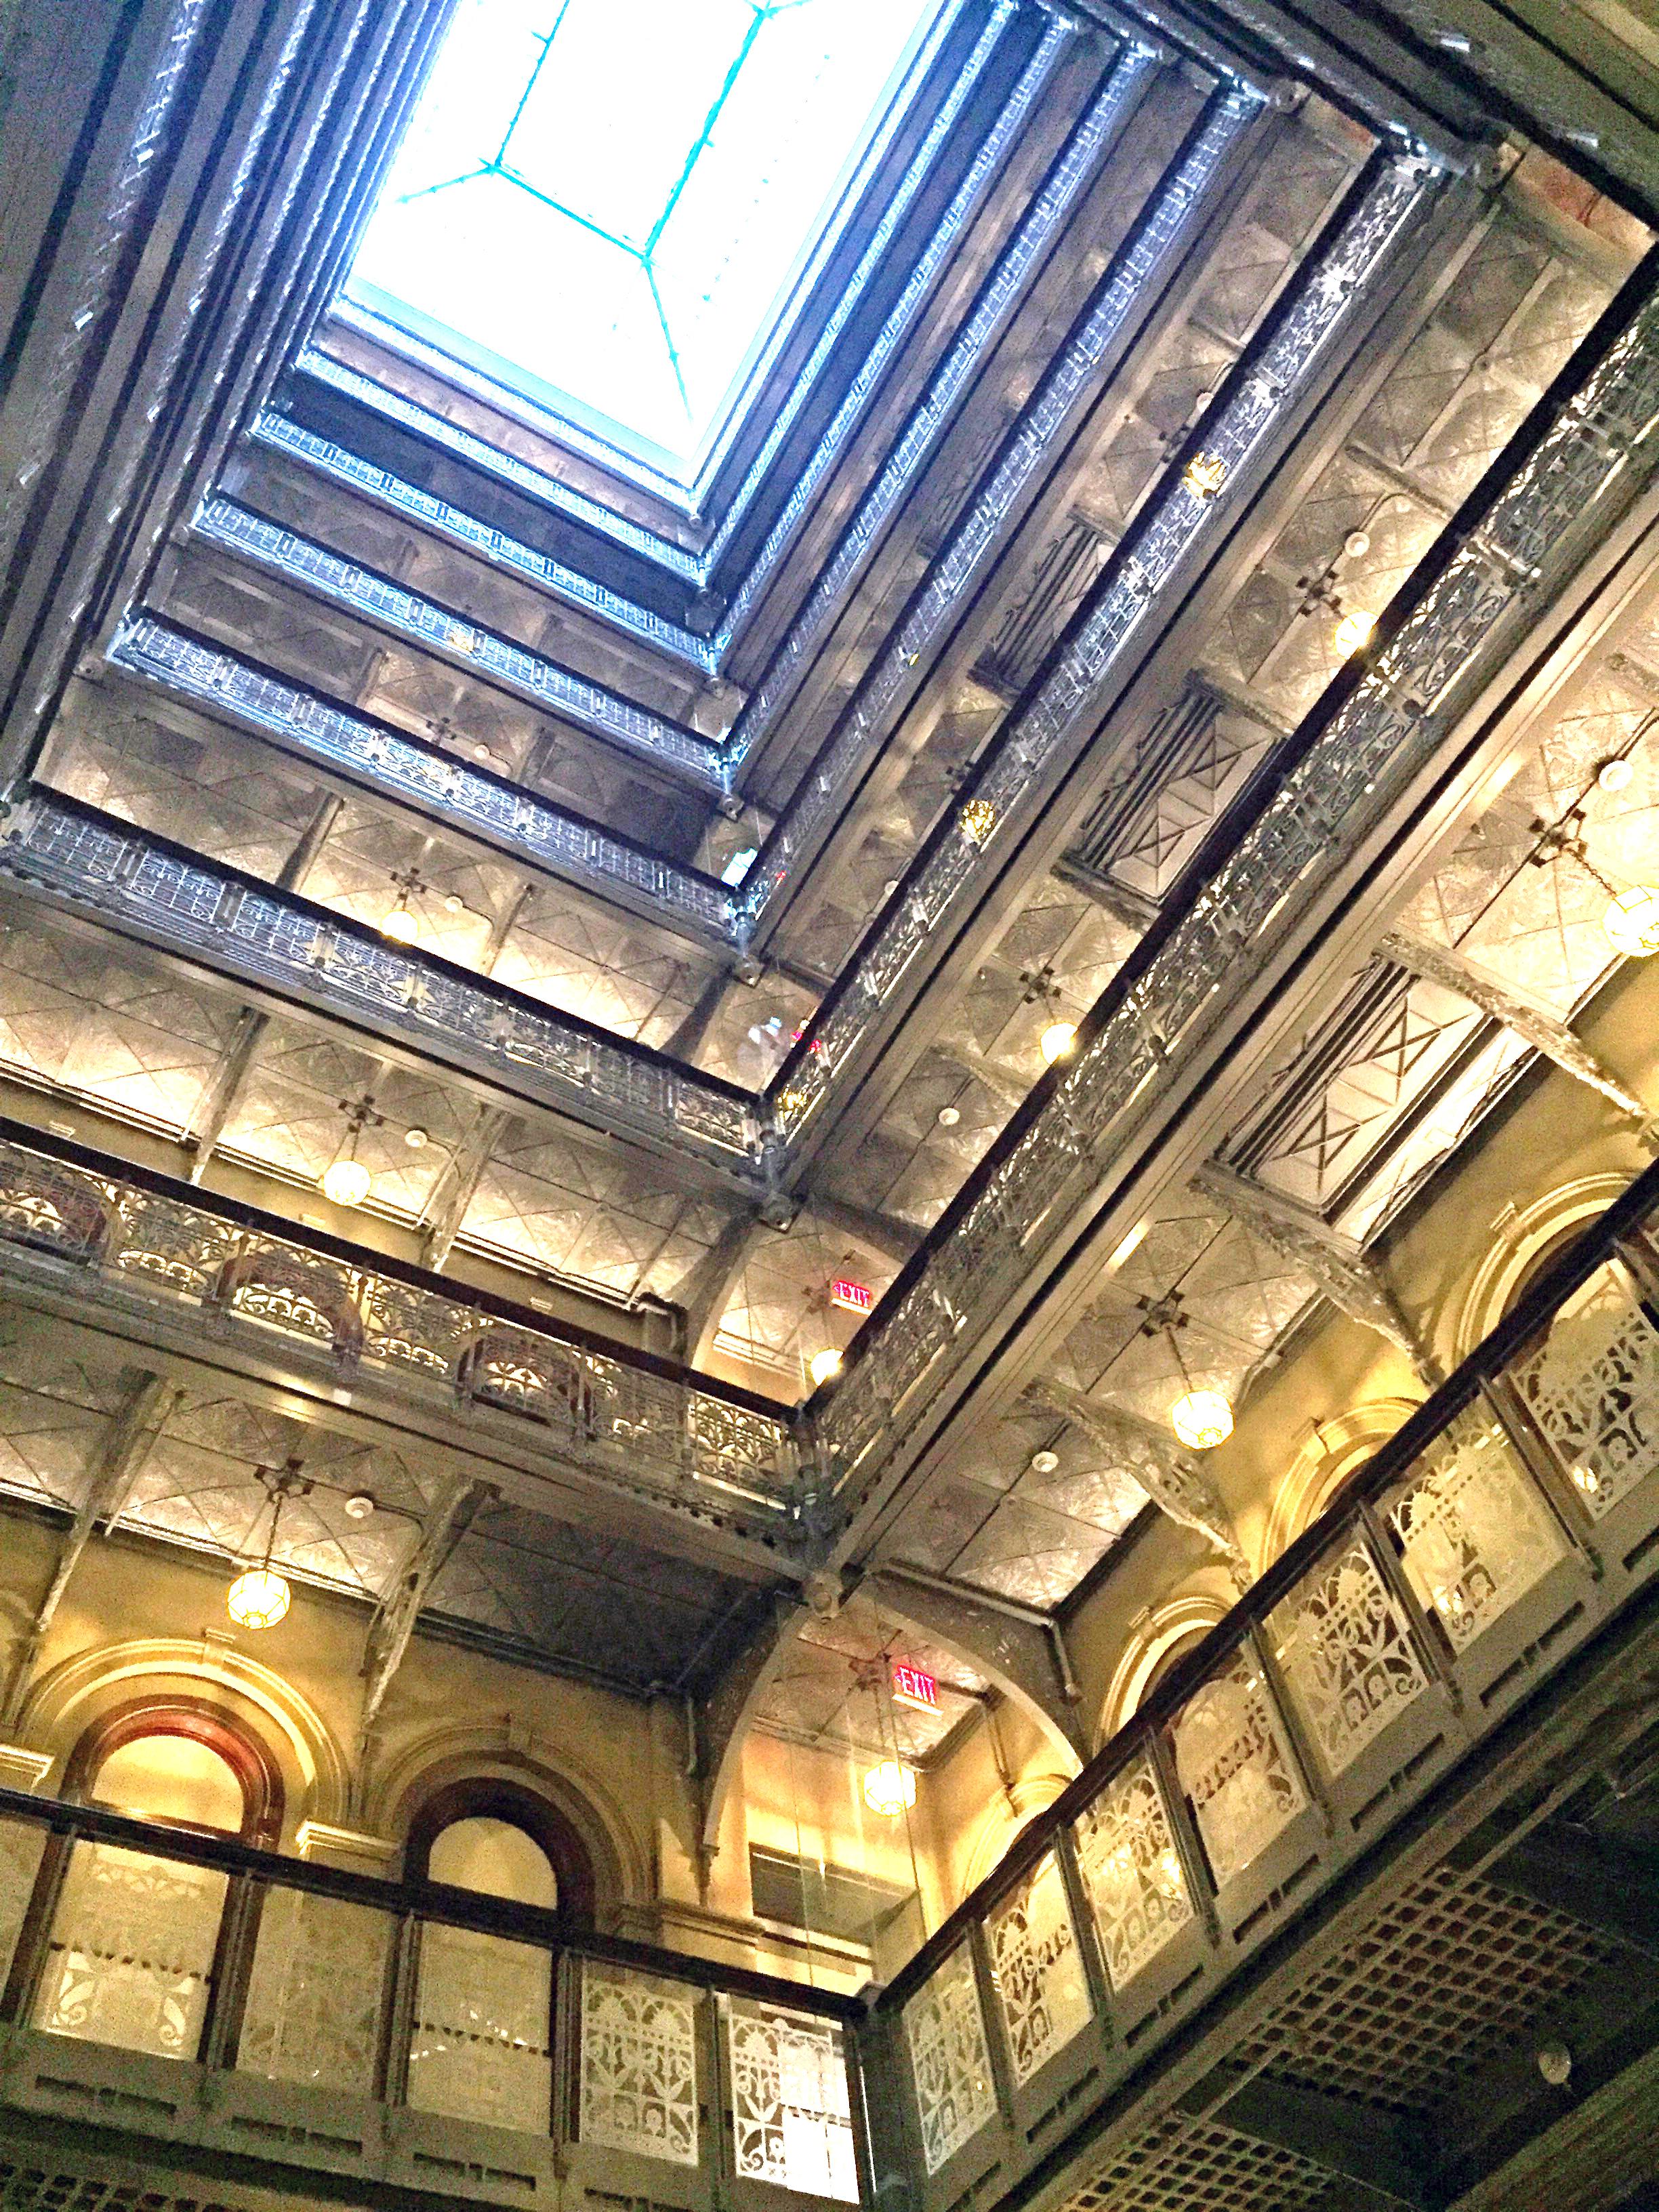 The Beekman Atrium